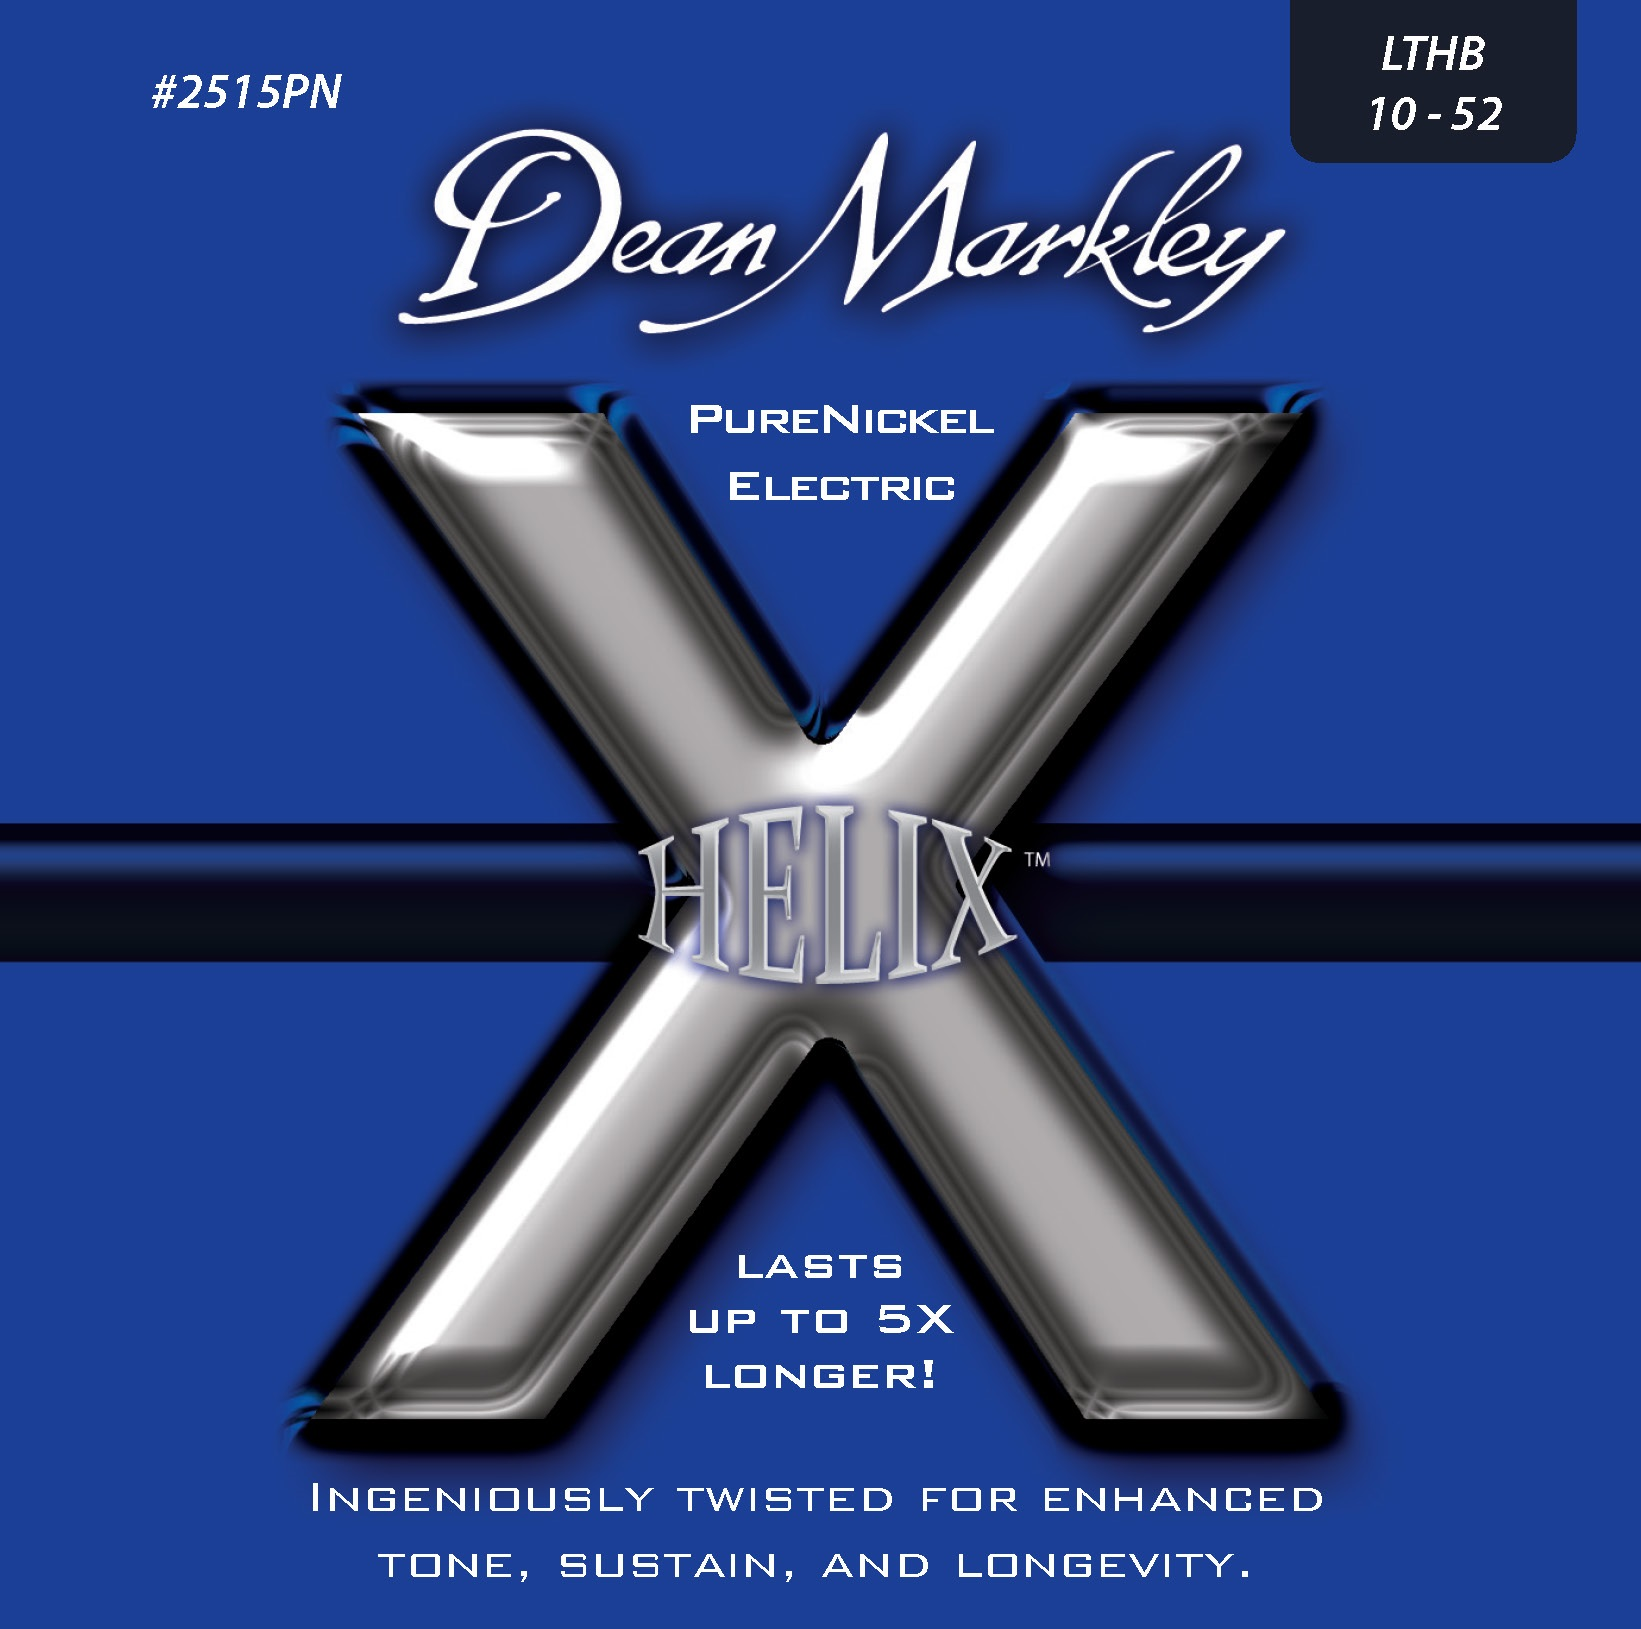 Dean Markley 2515PN LTHB 10-52 Helix PureNickel